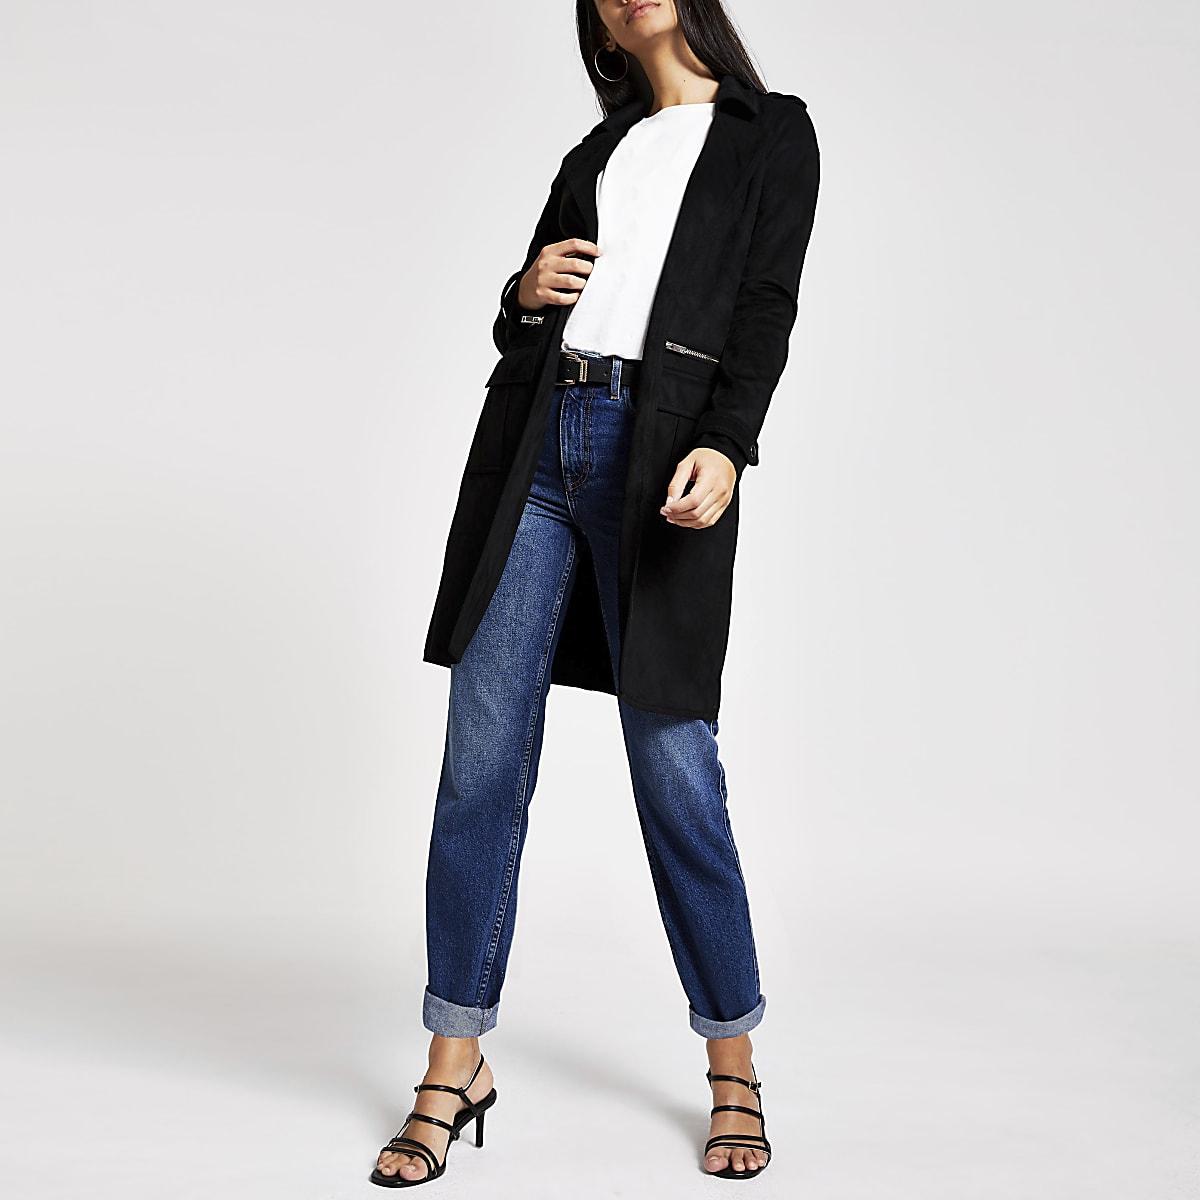 Black faux suede utility jacket